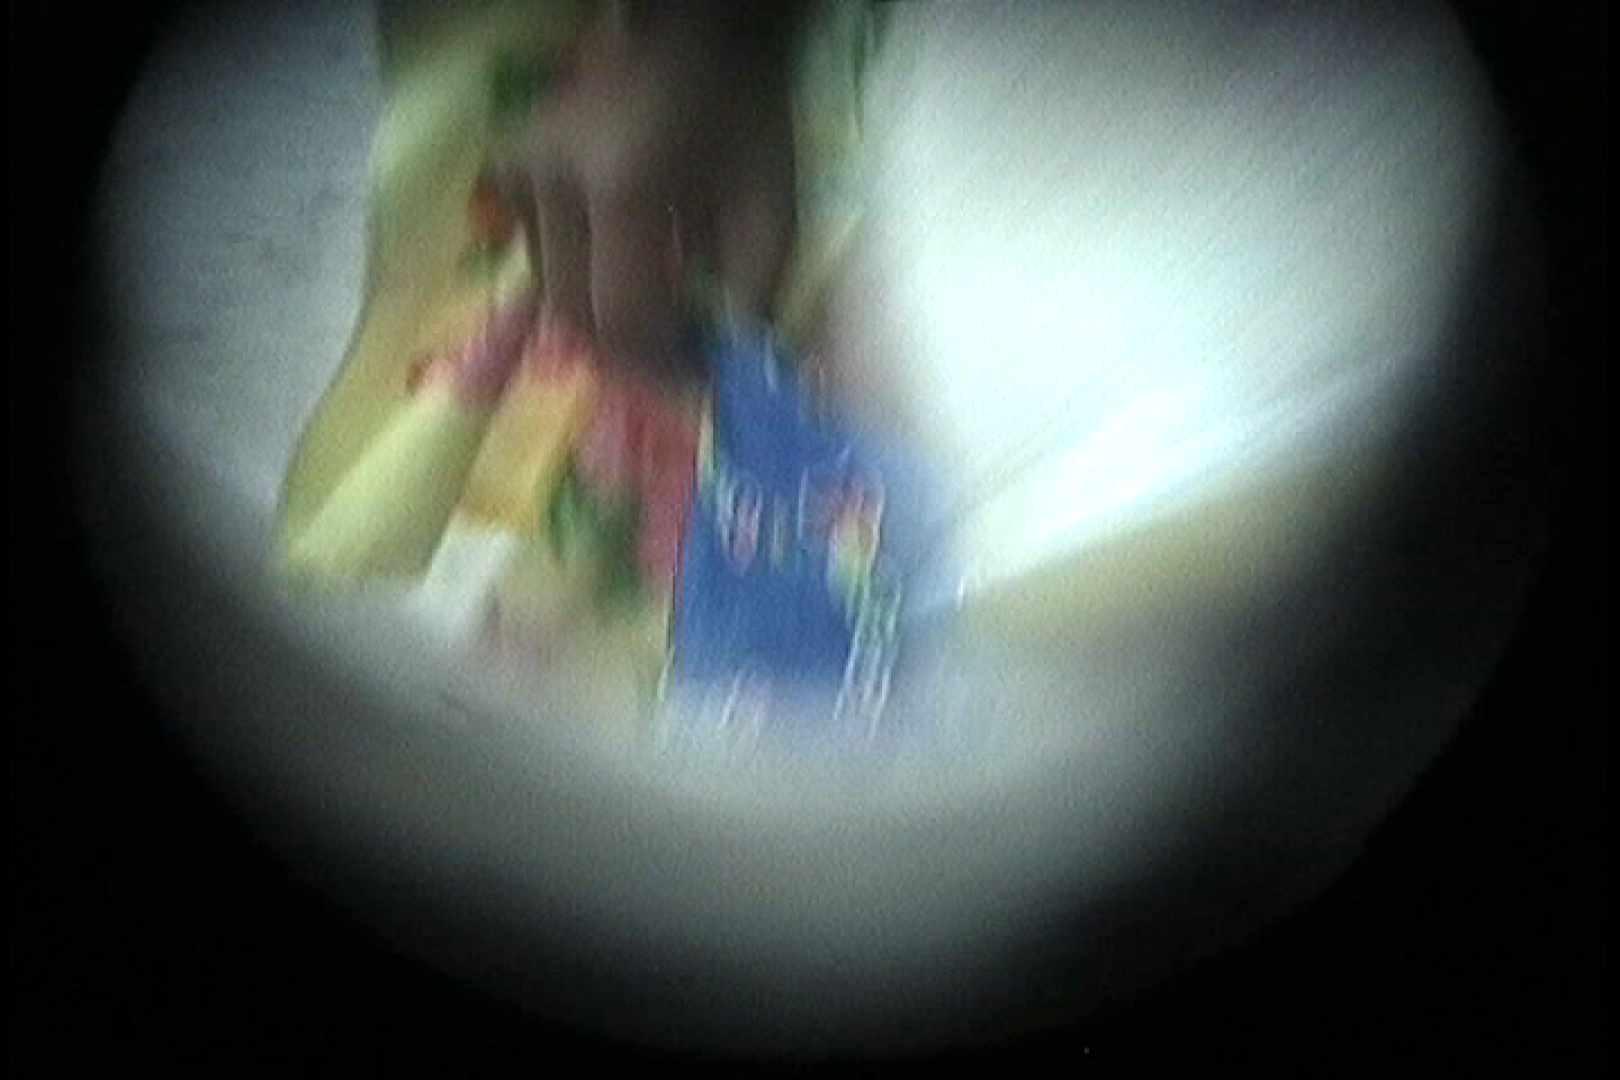 No.22 日焼け跡とオッパイの関係がおかしな貧乳ギャル 接写   貧乳  99枚 49